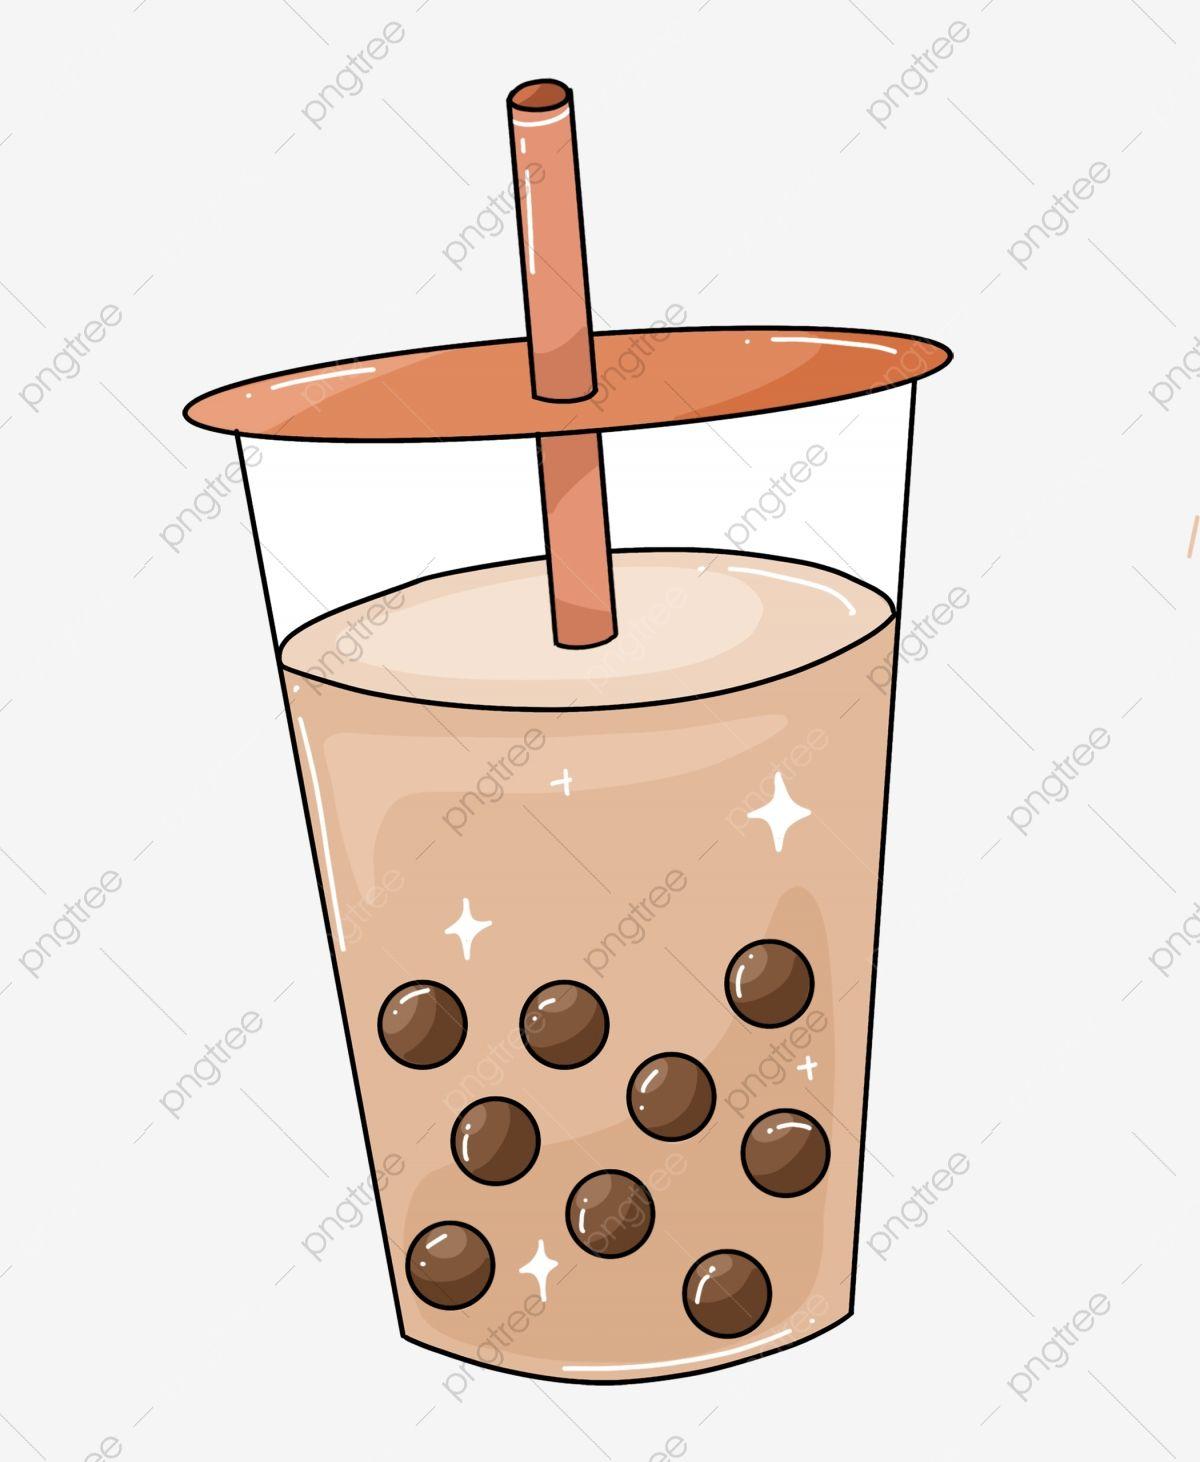 Download This Pearl Milk Tea Illustration Beverage Pearl Milk Tea Delicious Png Clipart Image With Transparent Backg Tea Illustration Milk Tea Tea Wallpaper